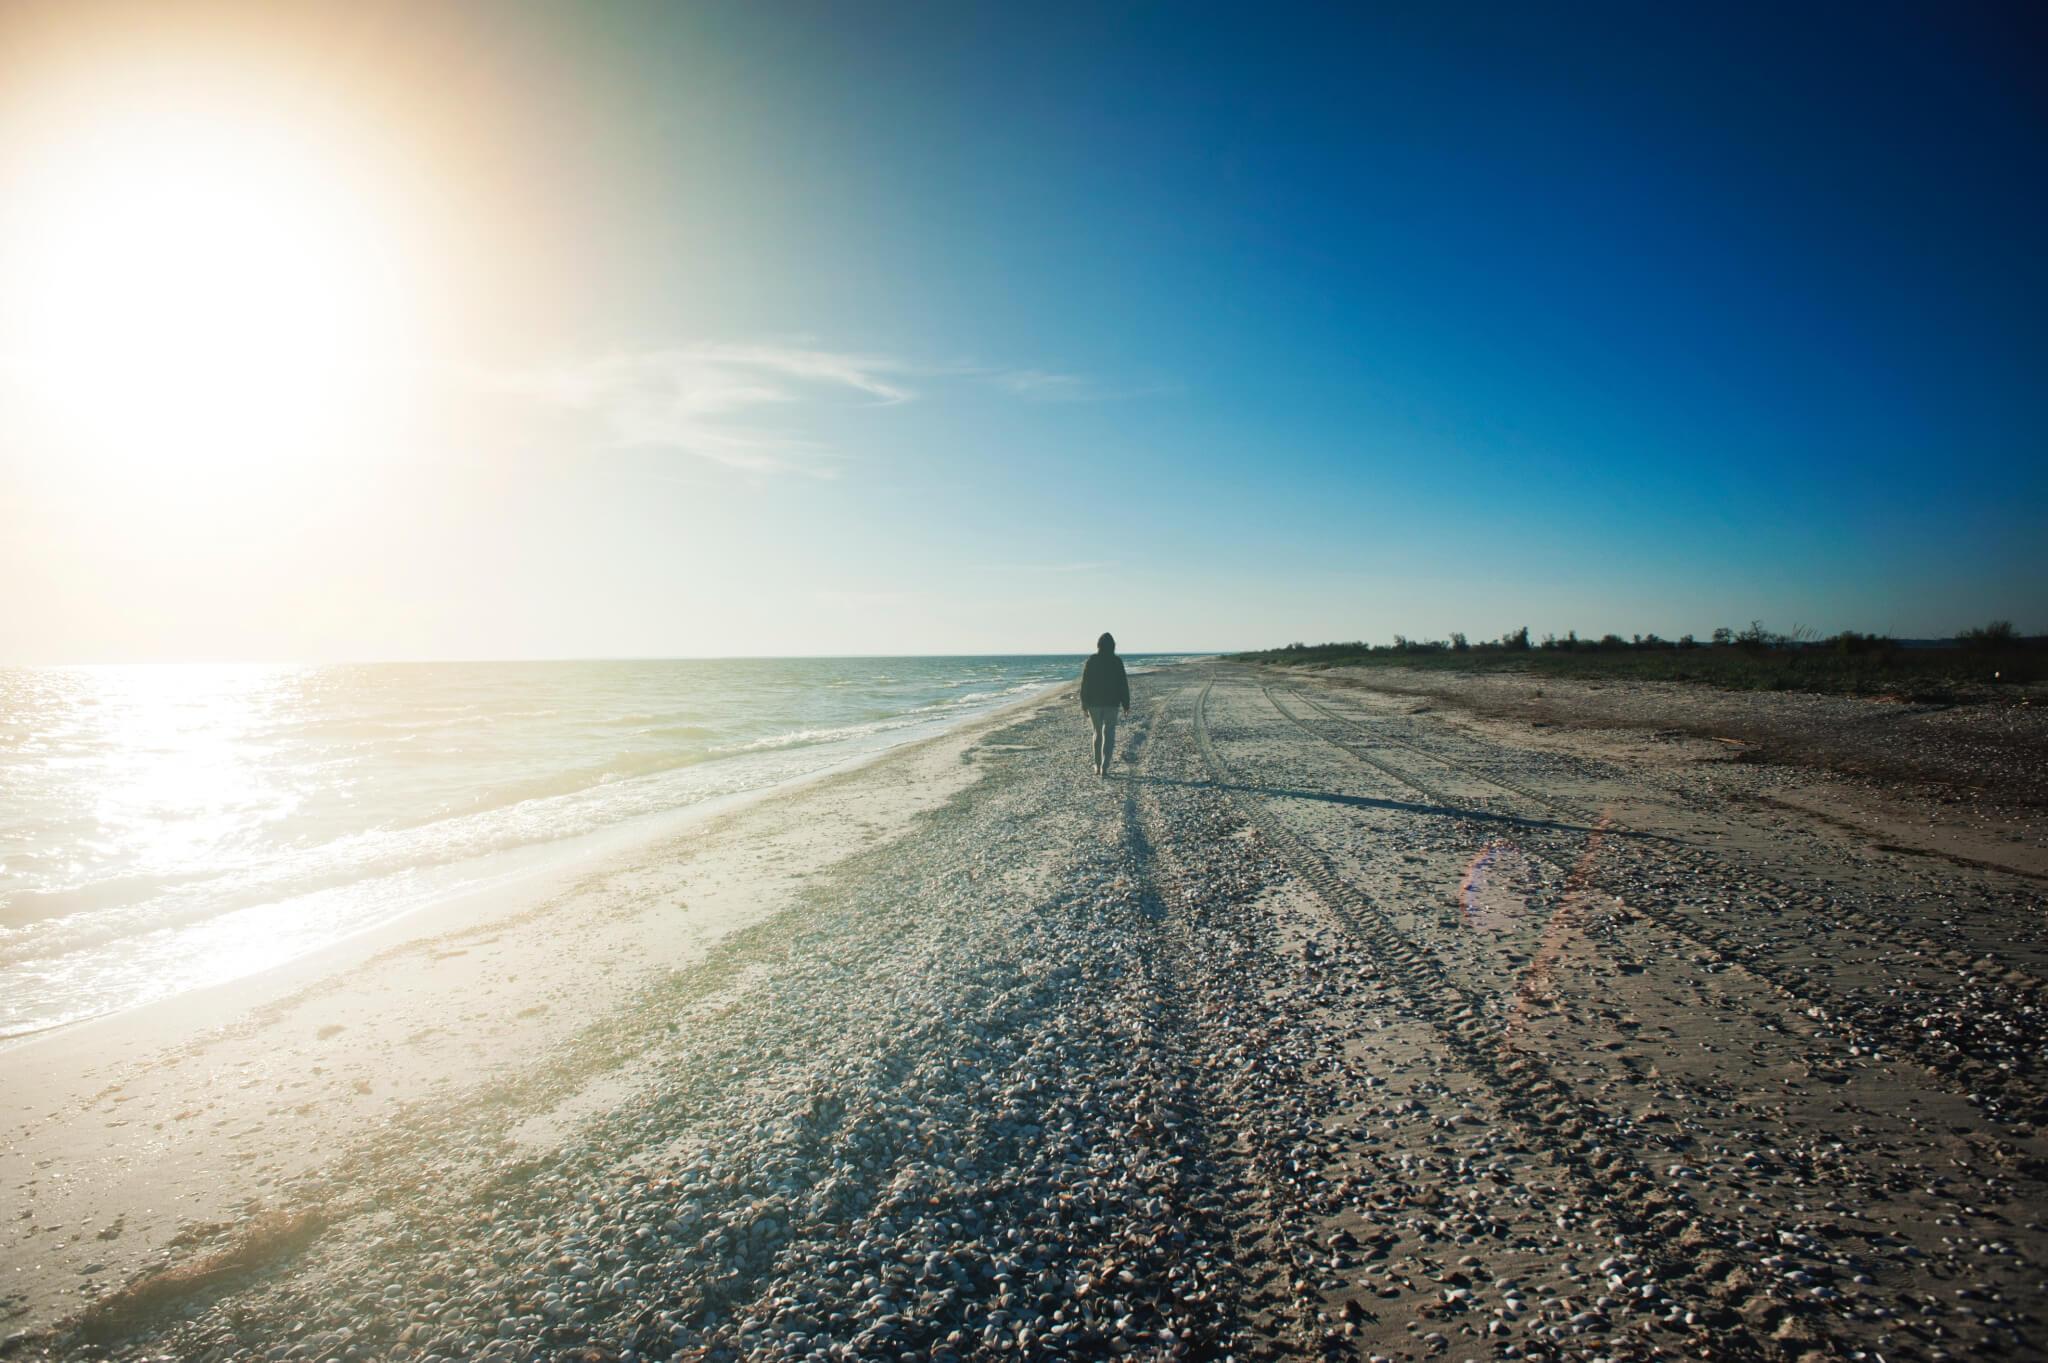 Person walking along beach